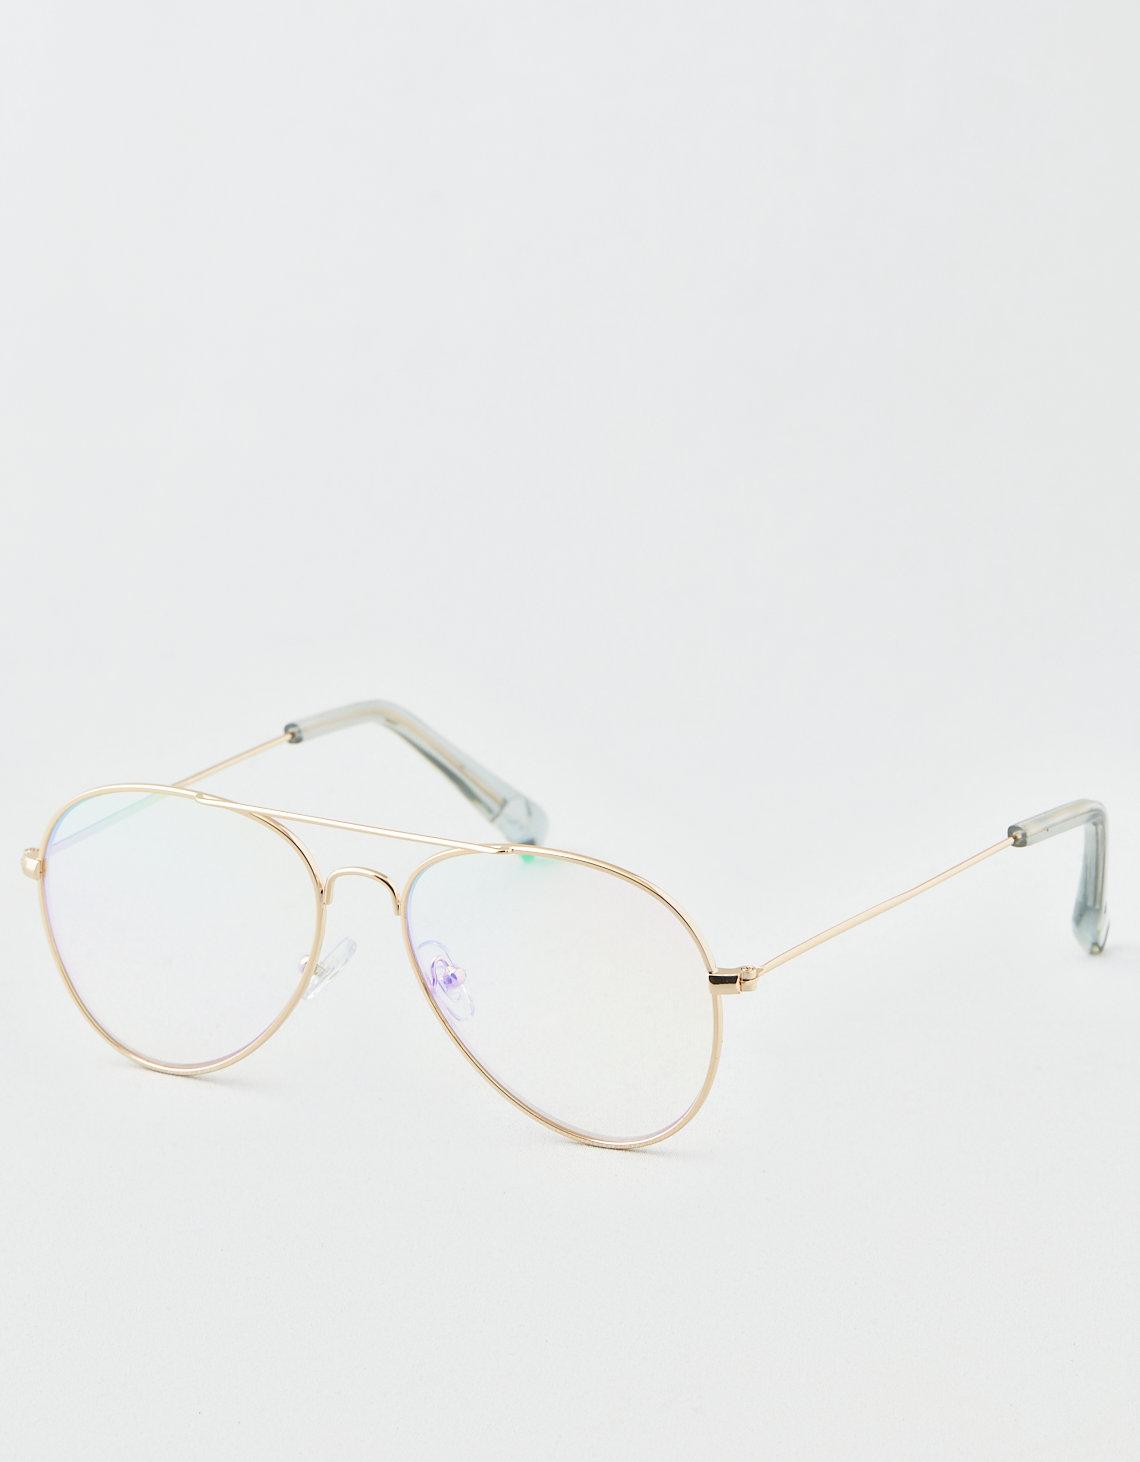 72319f3853 AE Transluscent Rainbow Aviator Sunglasses. Placeholder image. Product Image